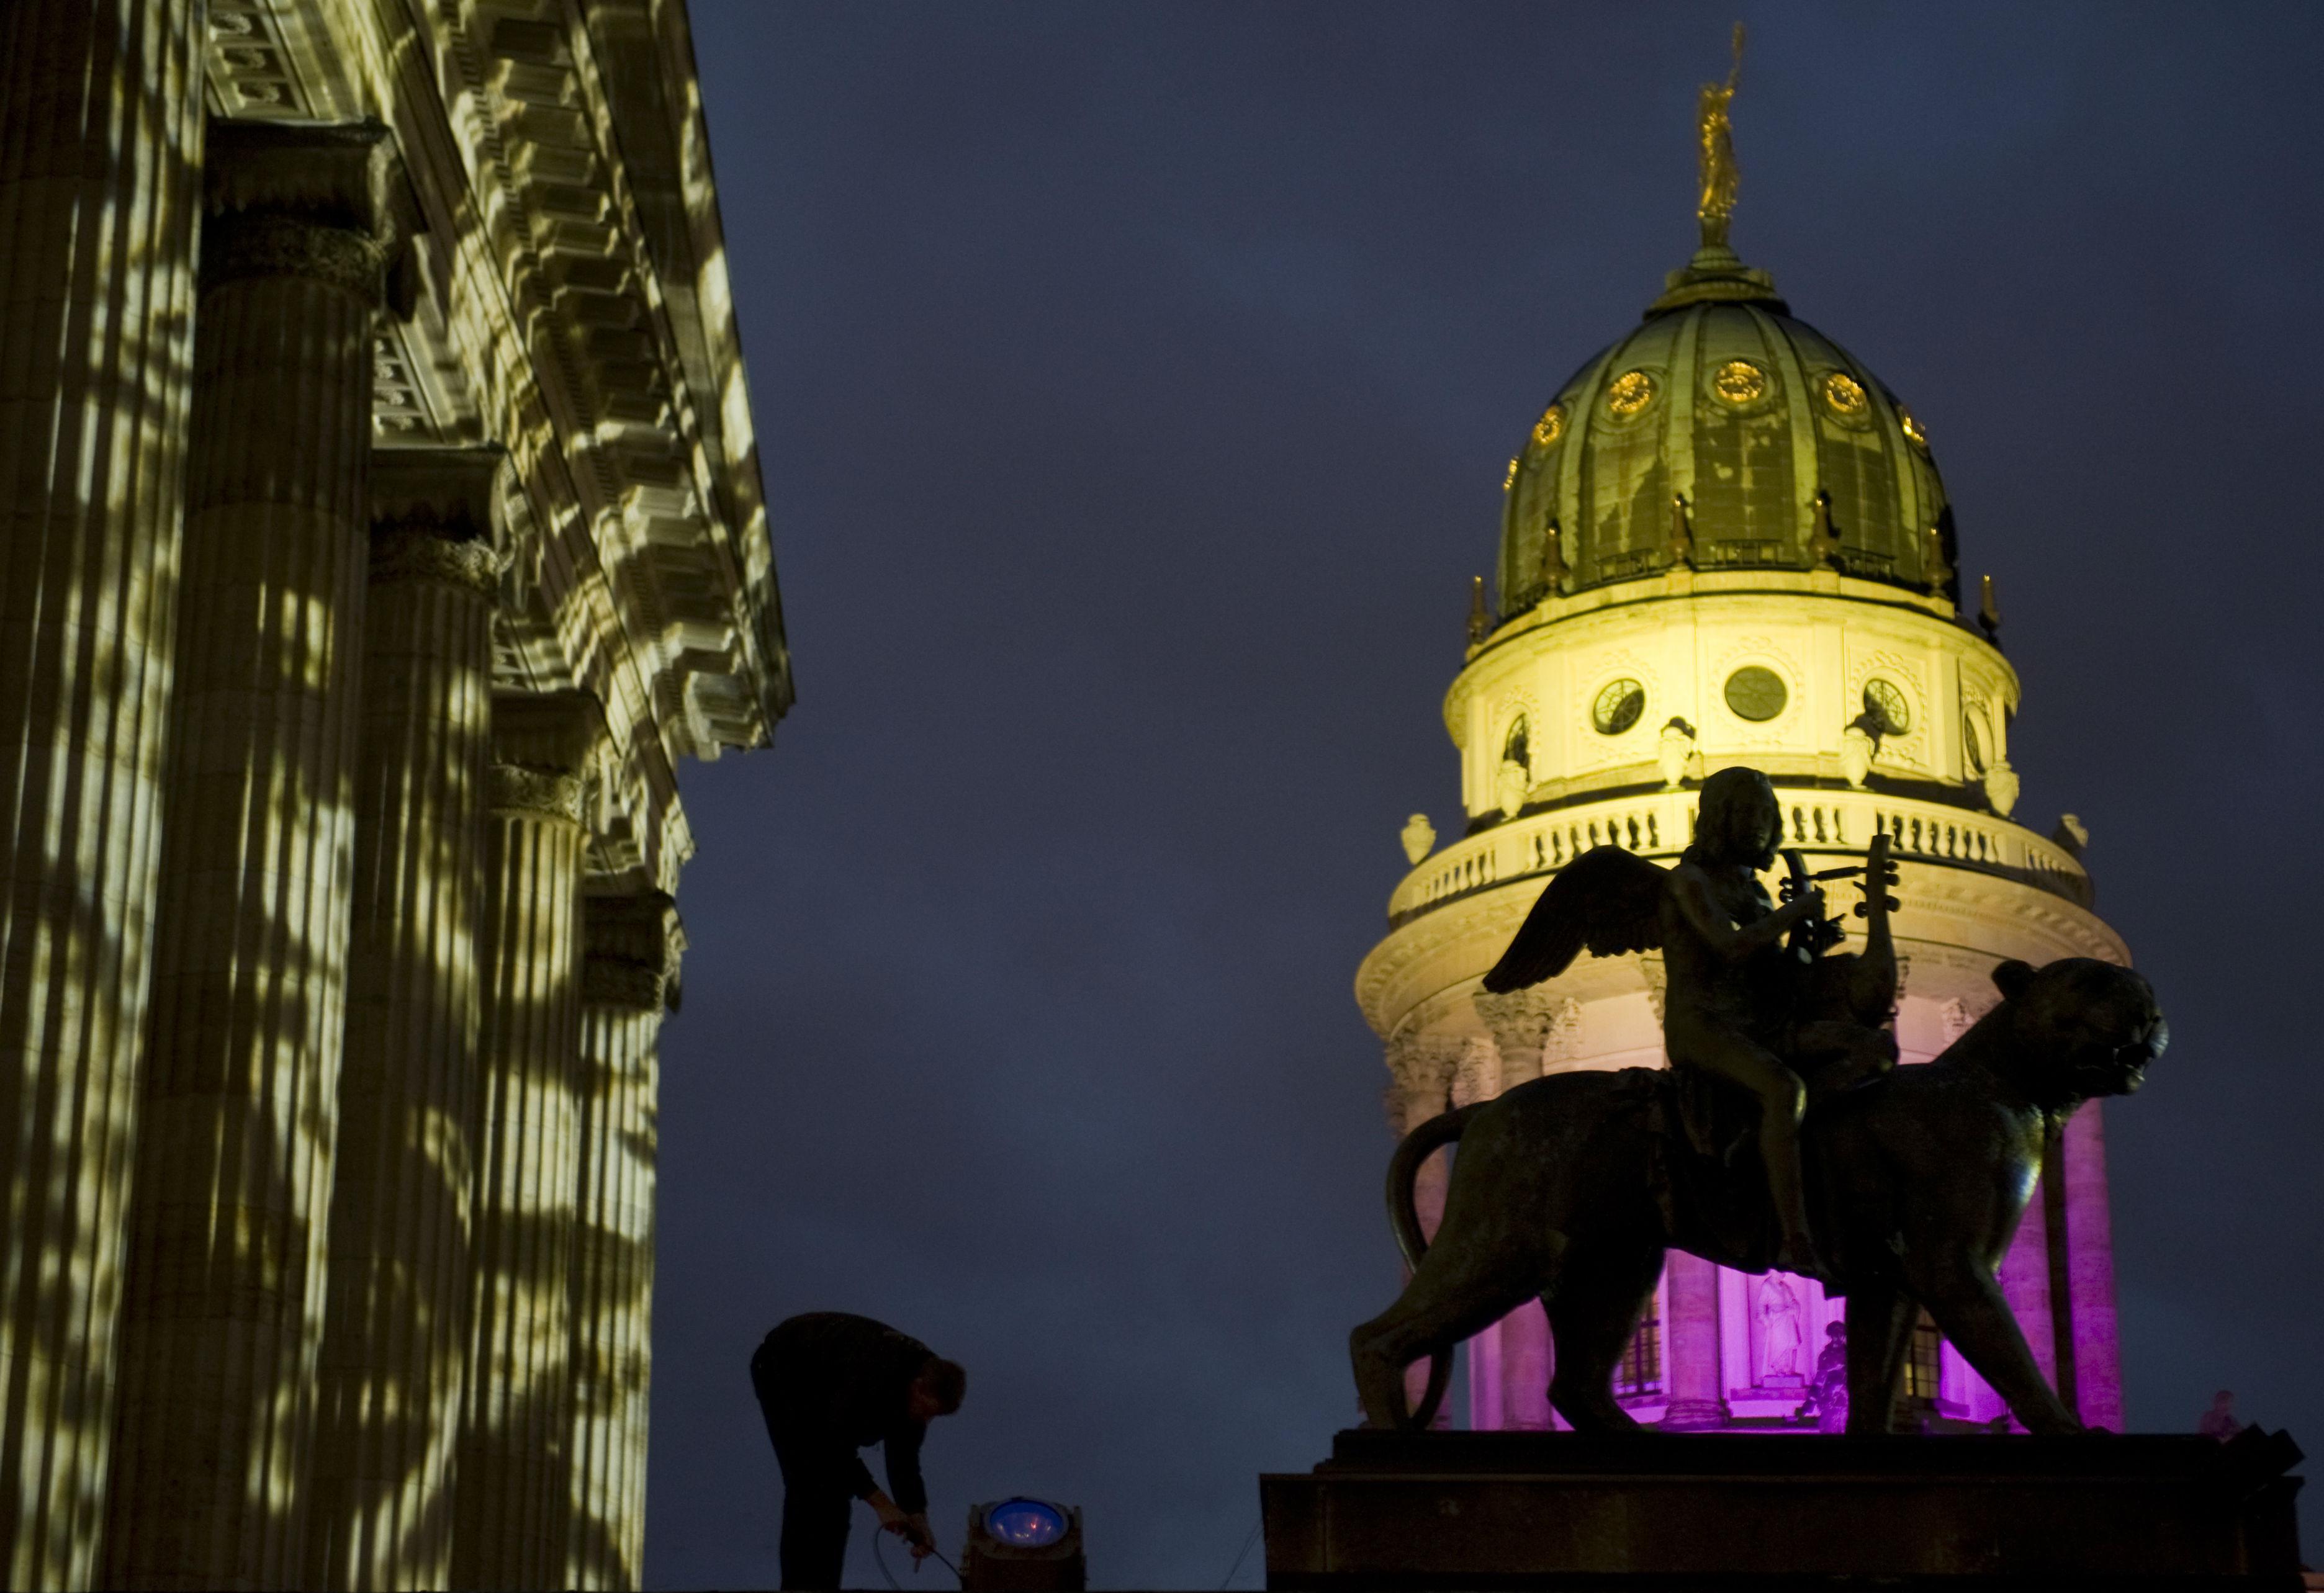 Berlin's Festival of Lights